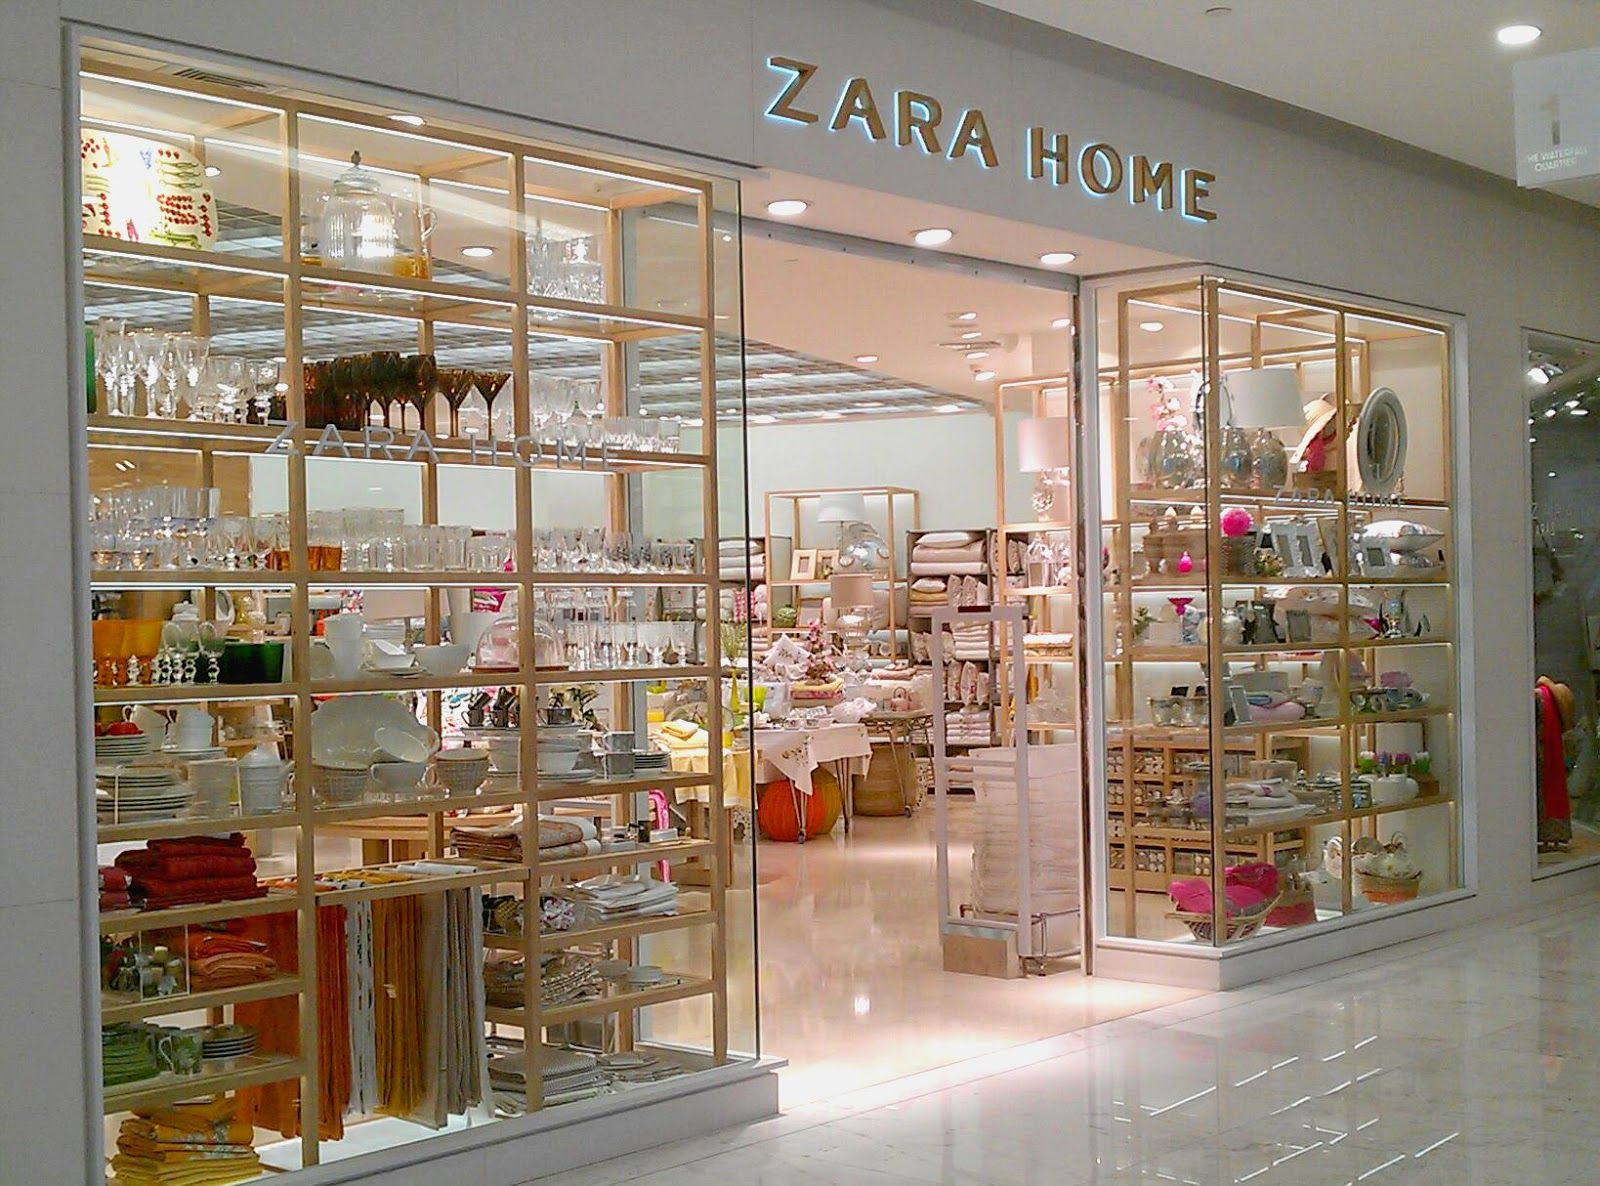 Zara home to open in toronto - Window Display Bangkok Thailand Zara Home Emquartier